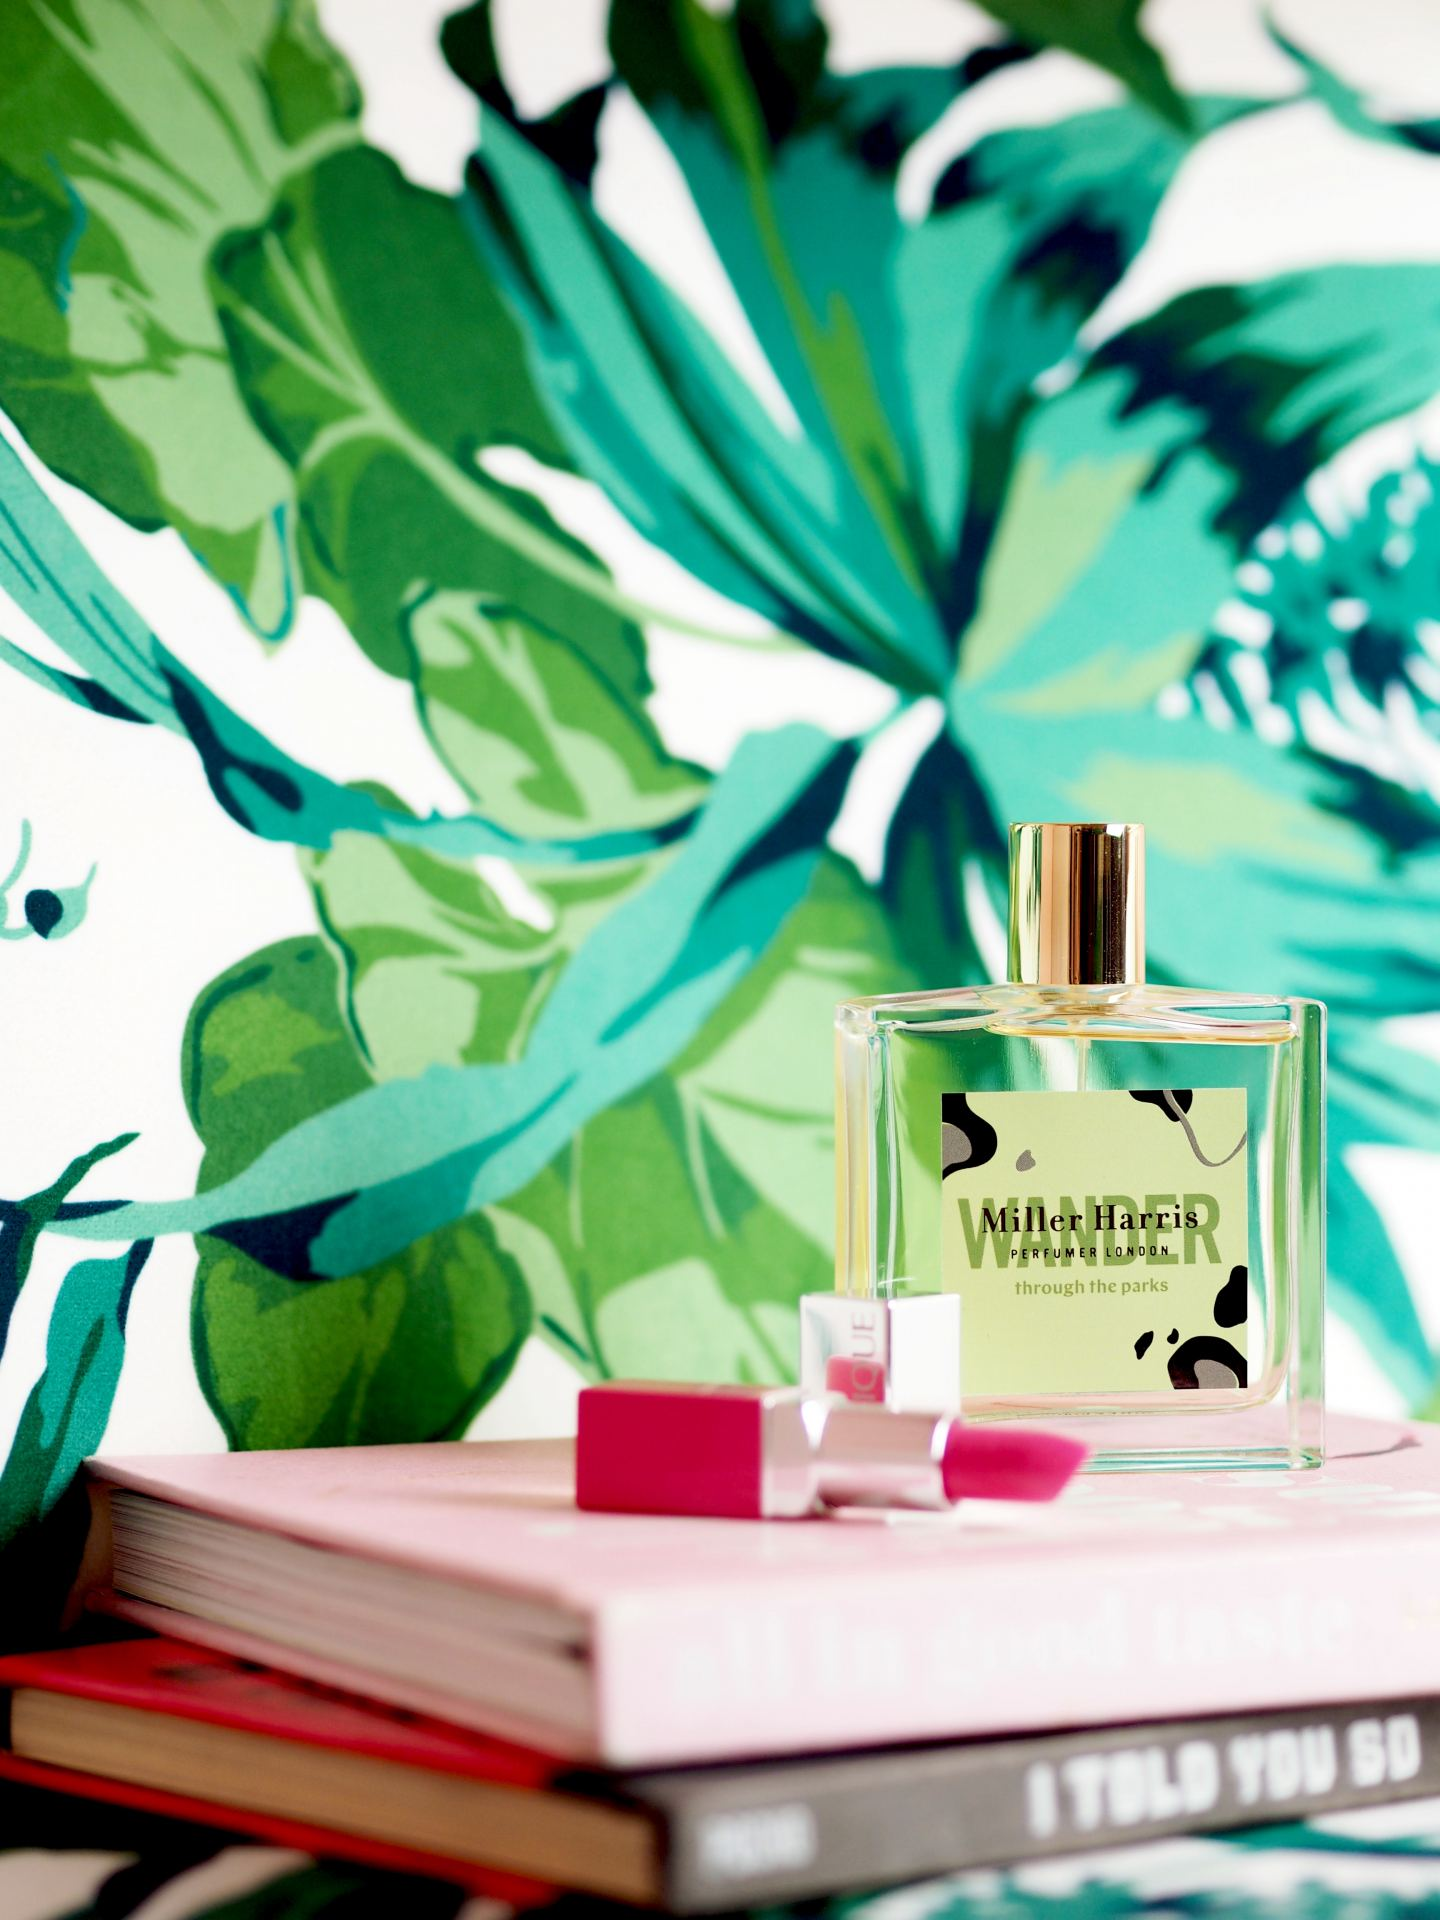 miller harris Miller Harris 'Wander' perfume fragrance 2018